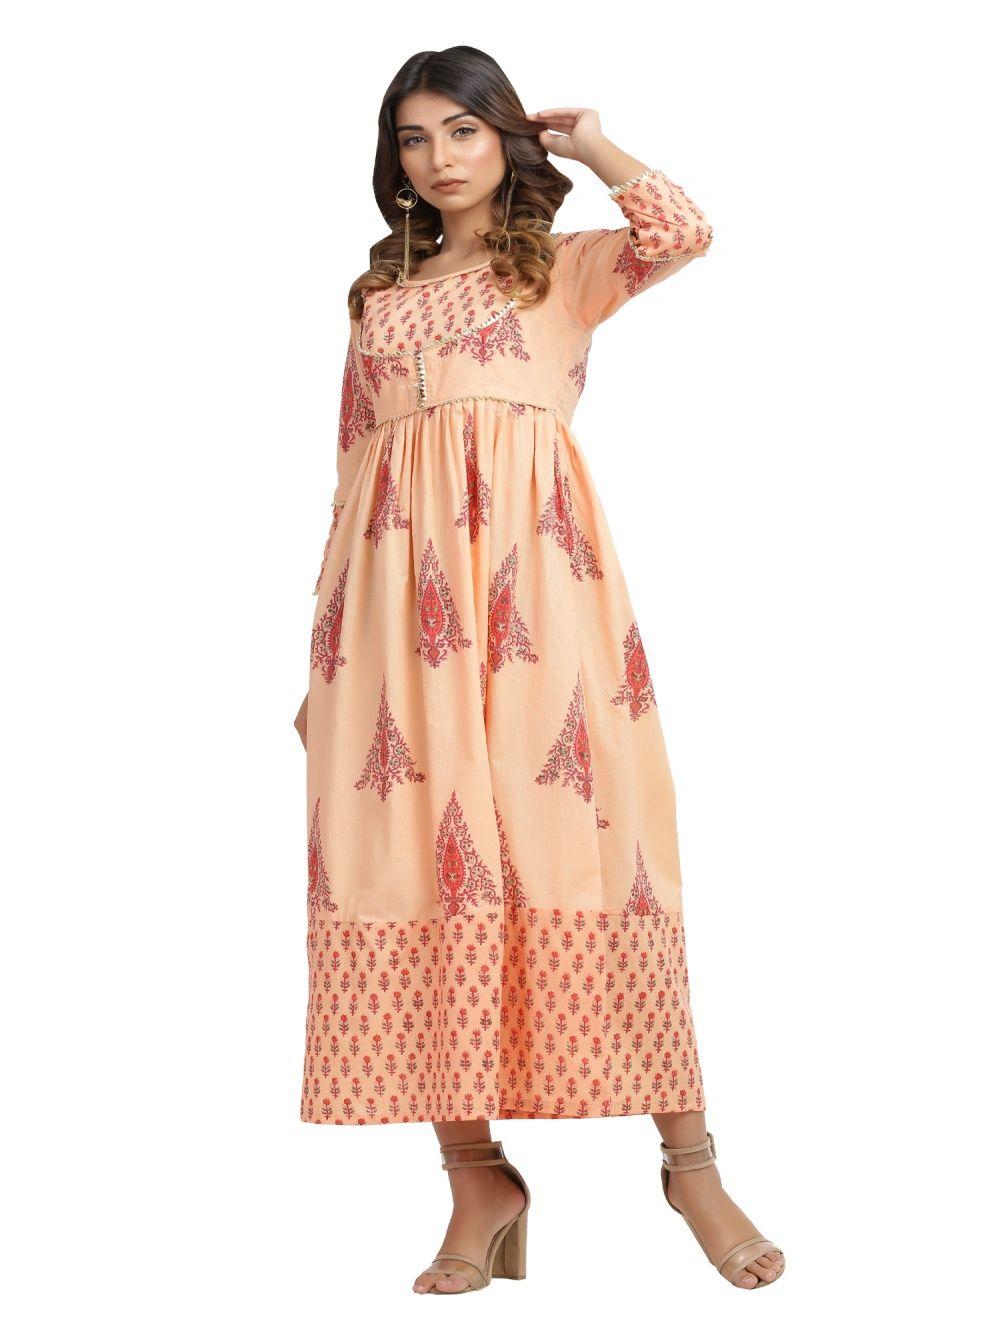 2d1f0ec736 Blue Lotus Dresses : Buy Blue Lotus Peach Ankle Length Maxi Dress ...